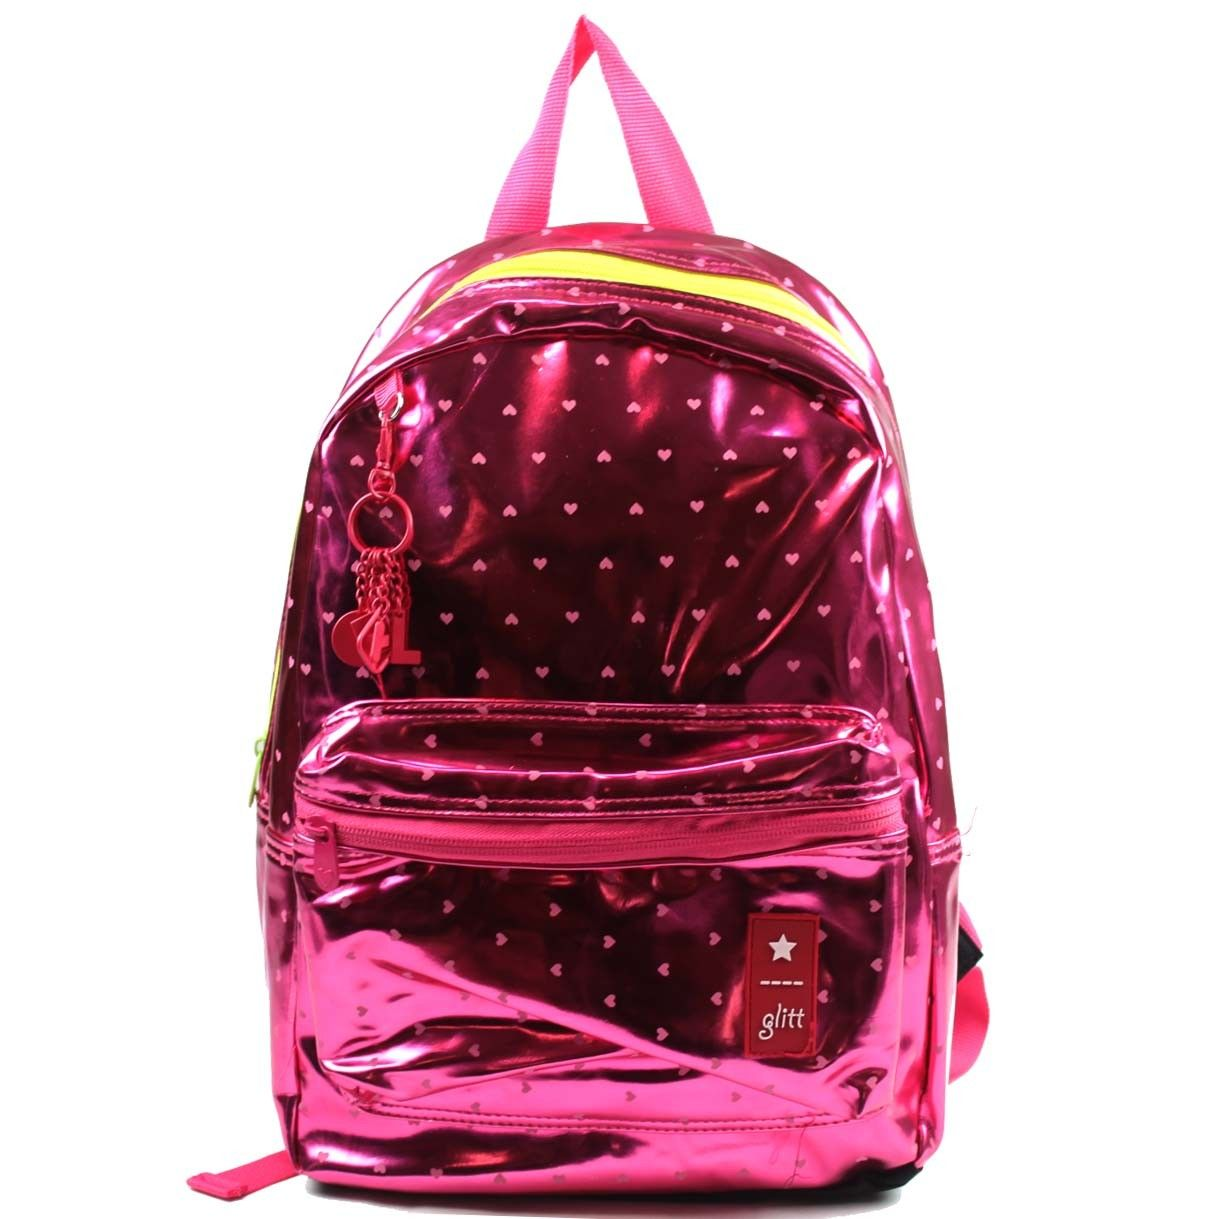 Bolsa Escolar Feminina Infantil : Mochila feminina seanite glitt mara bolsas malas e